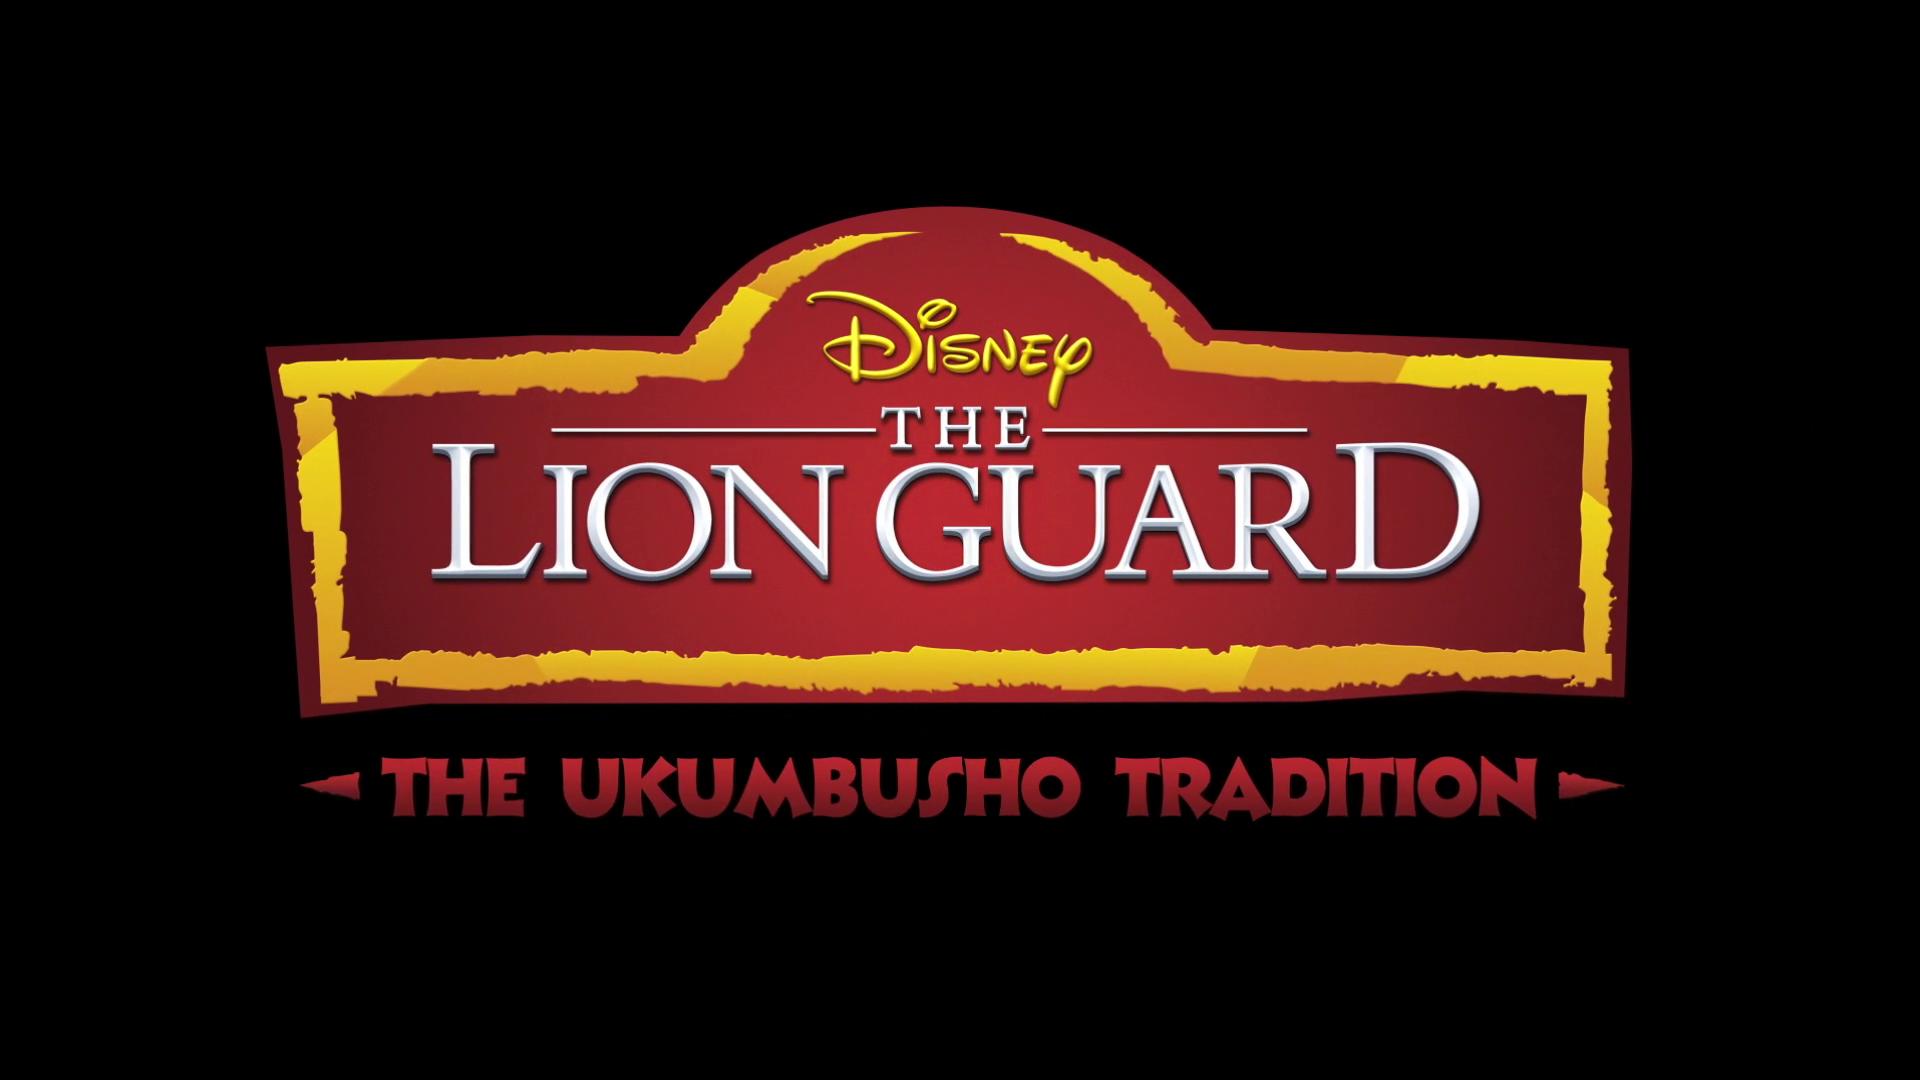 The Ukumbusho Tradition